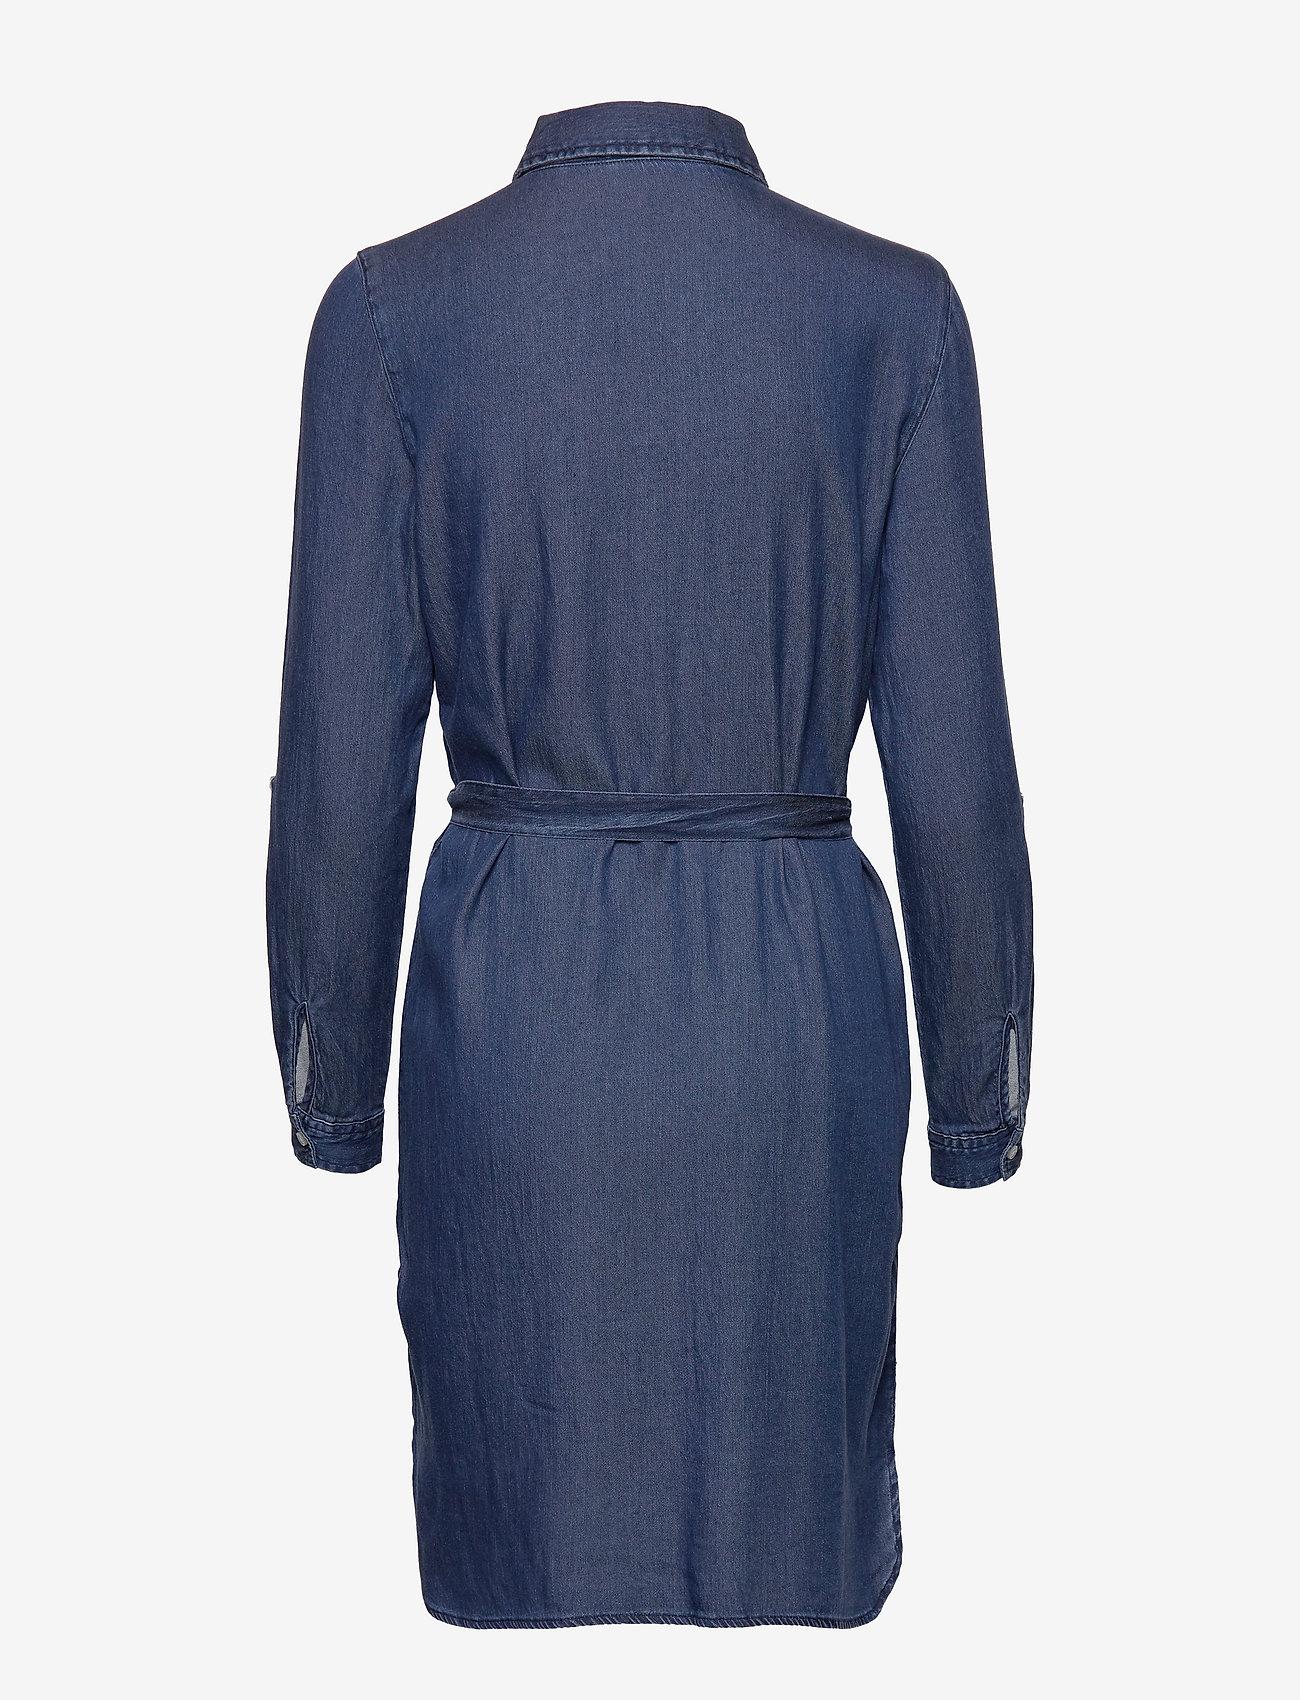 Vila - VIBISTA DENIM BELT DRESS/SU - NOOS - shirt dresses - dark blue denim - 1